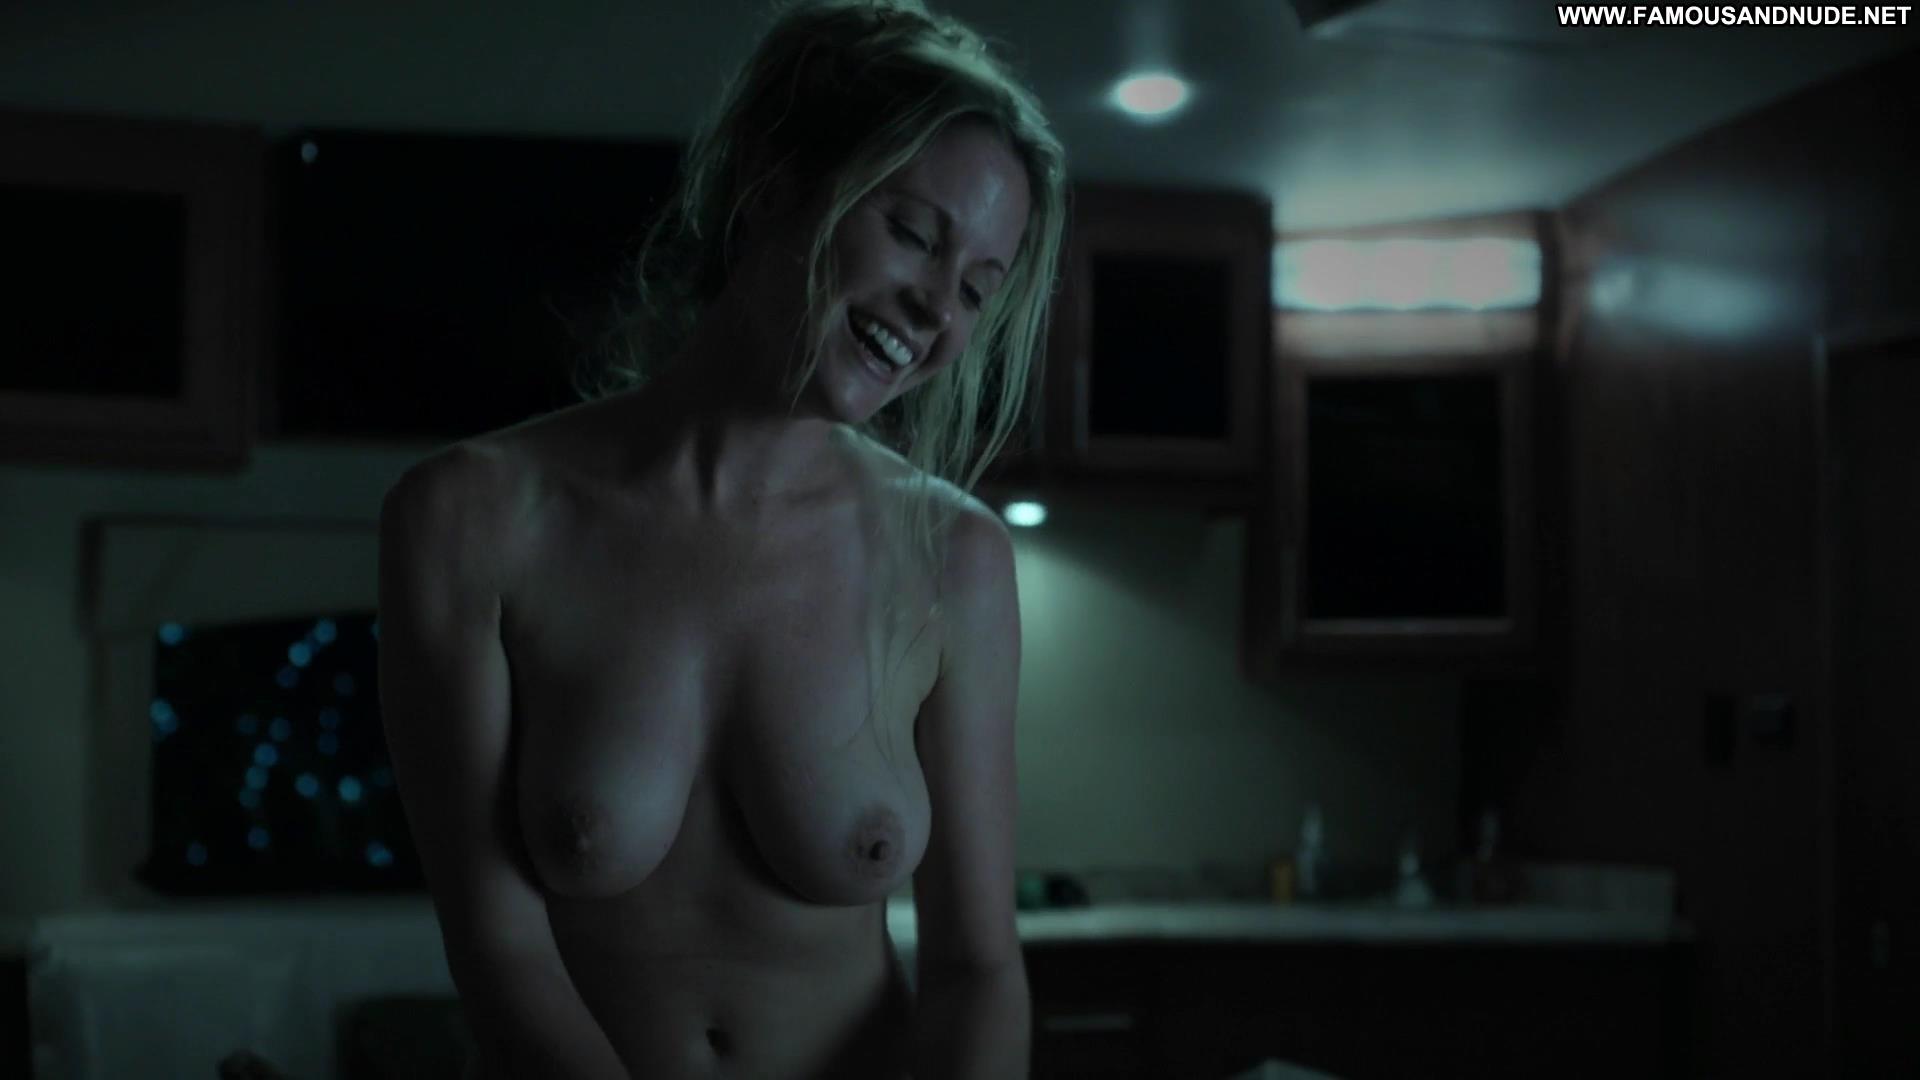 Ivana milicevic naked in show banshee 9